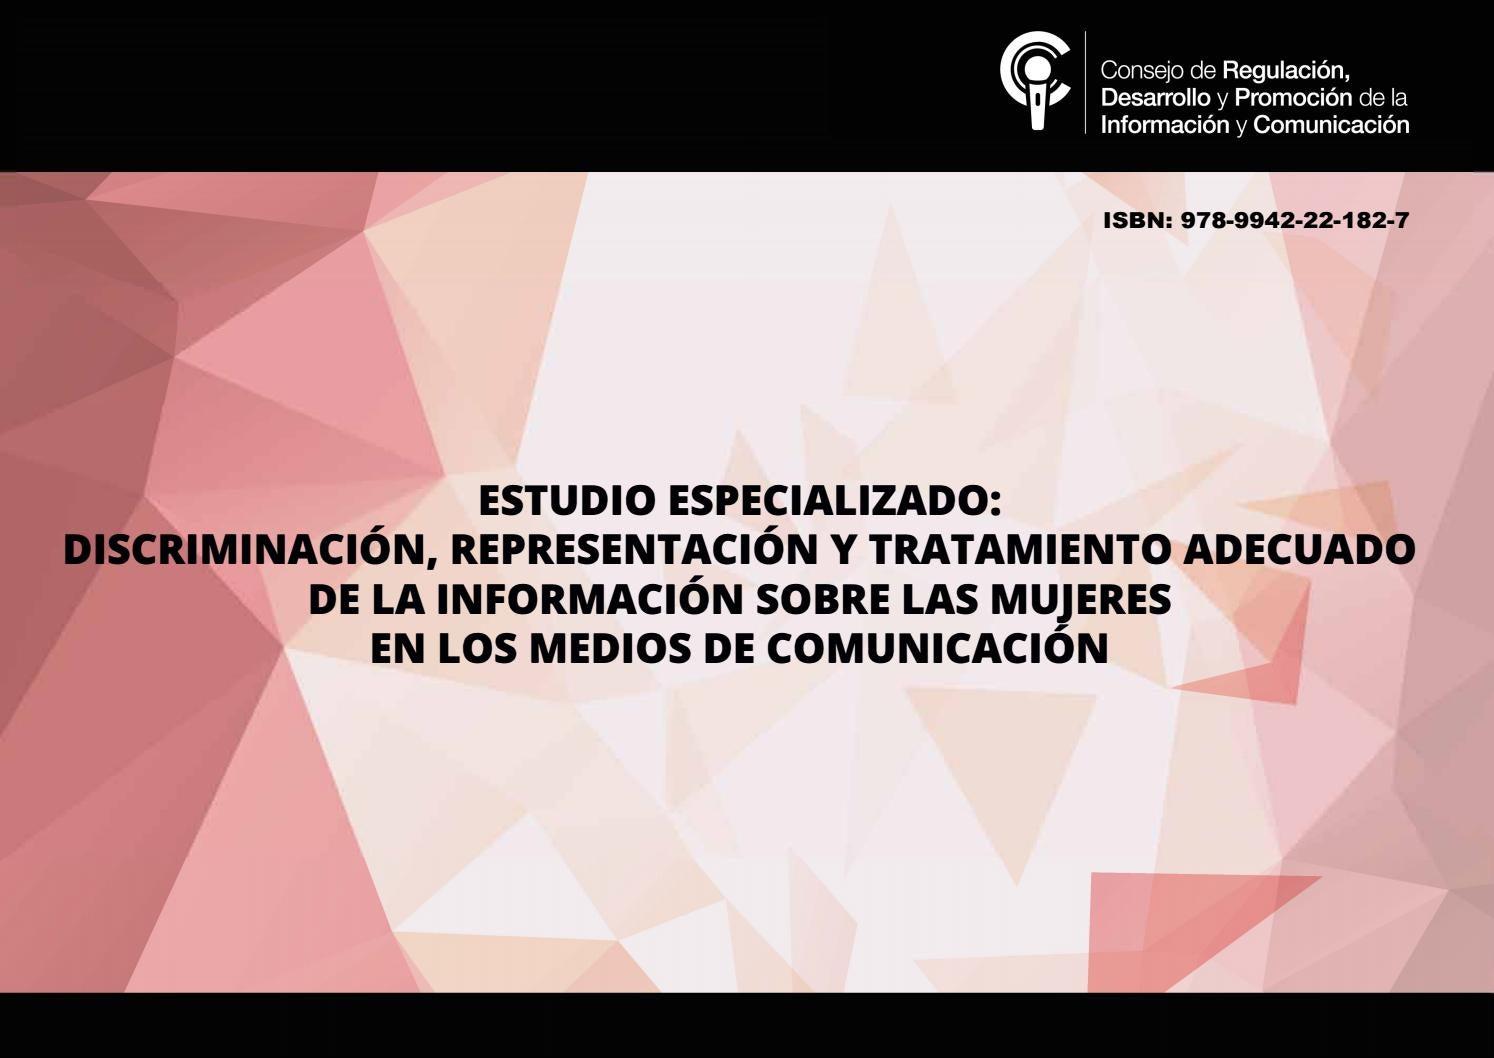 Mujeres Buscando-571198